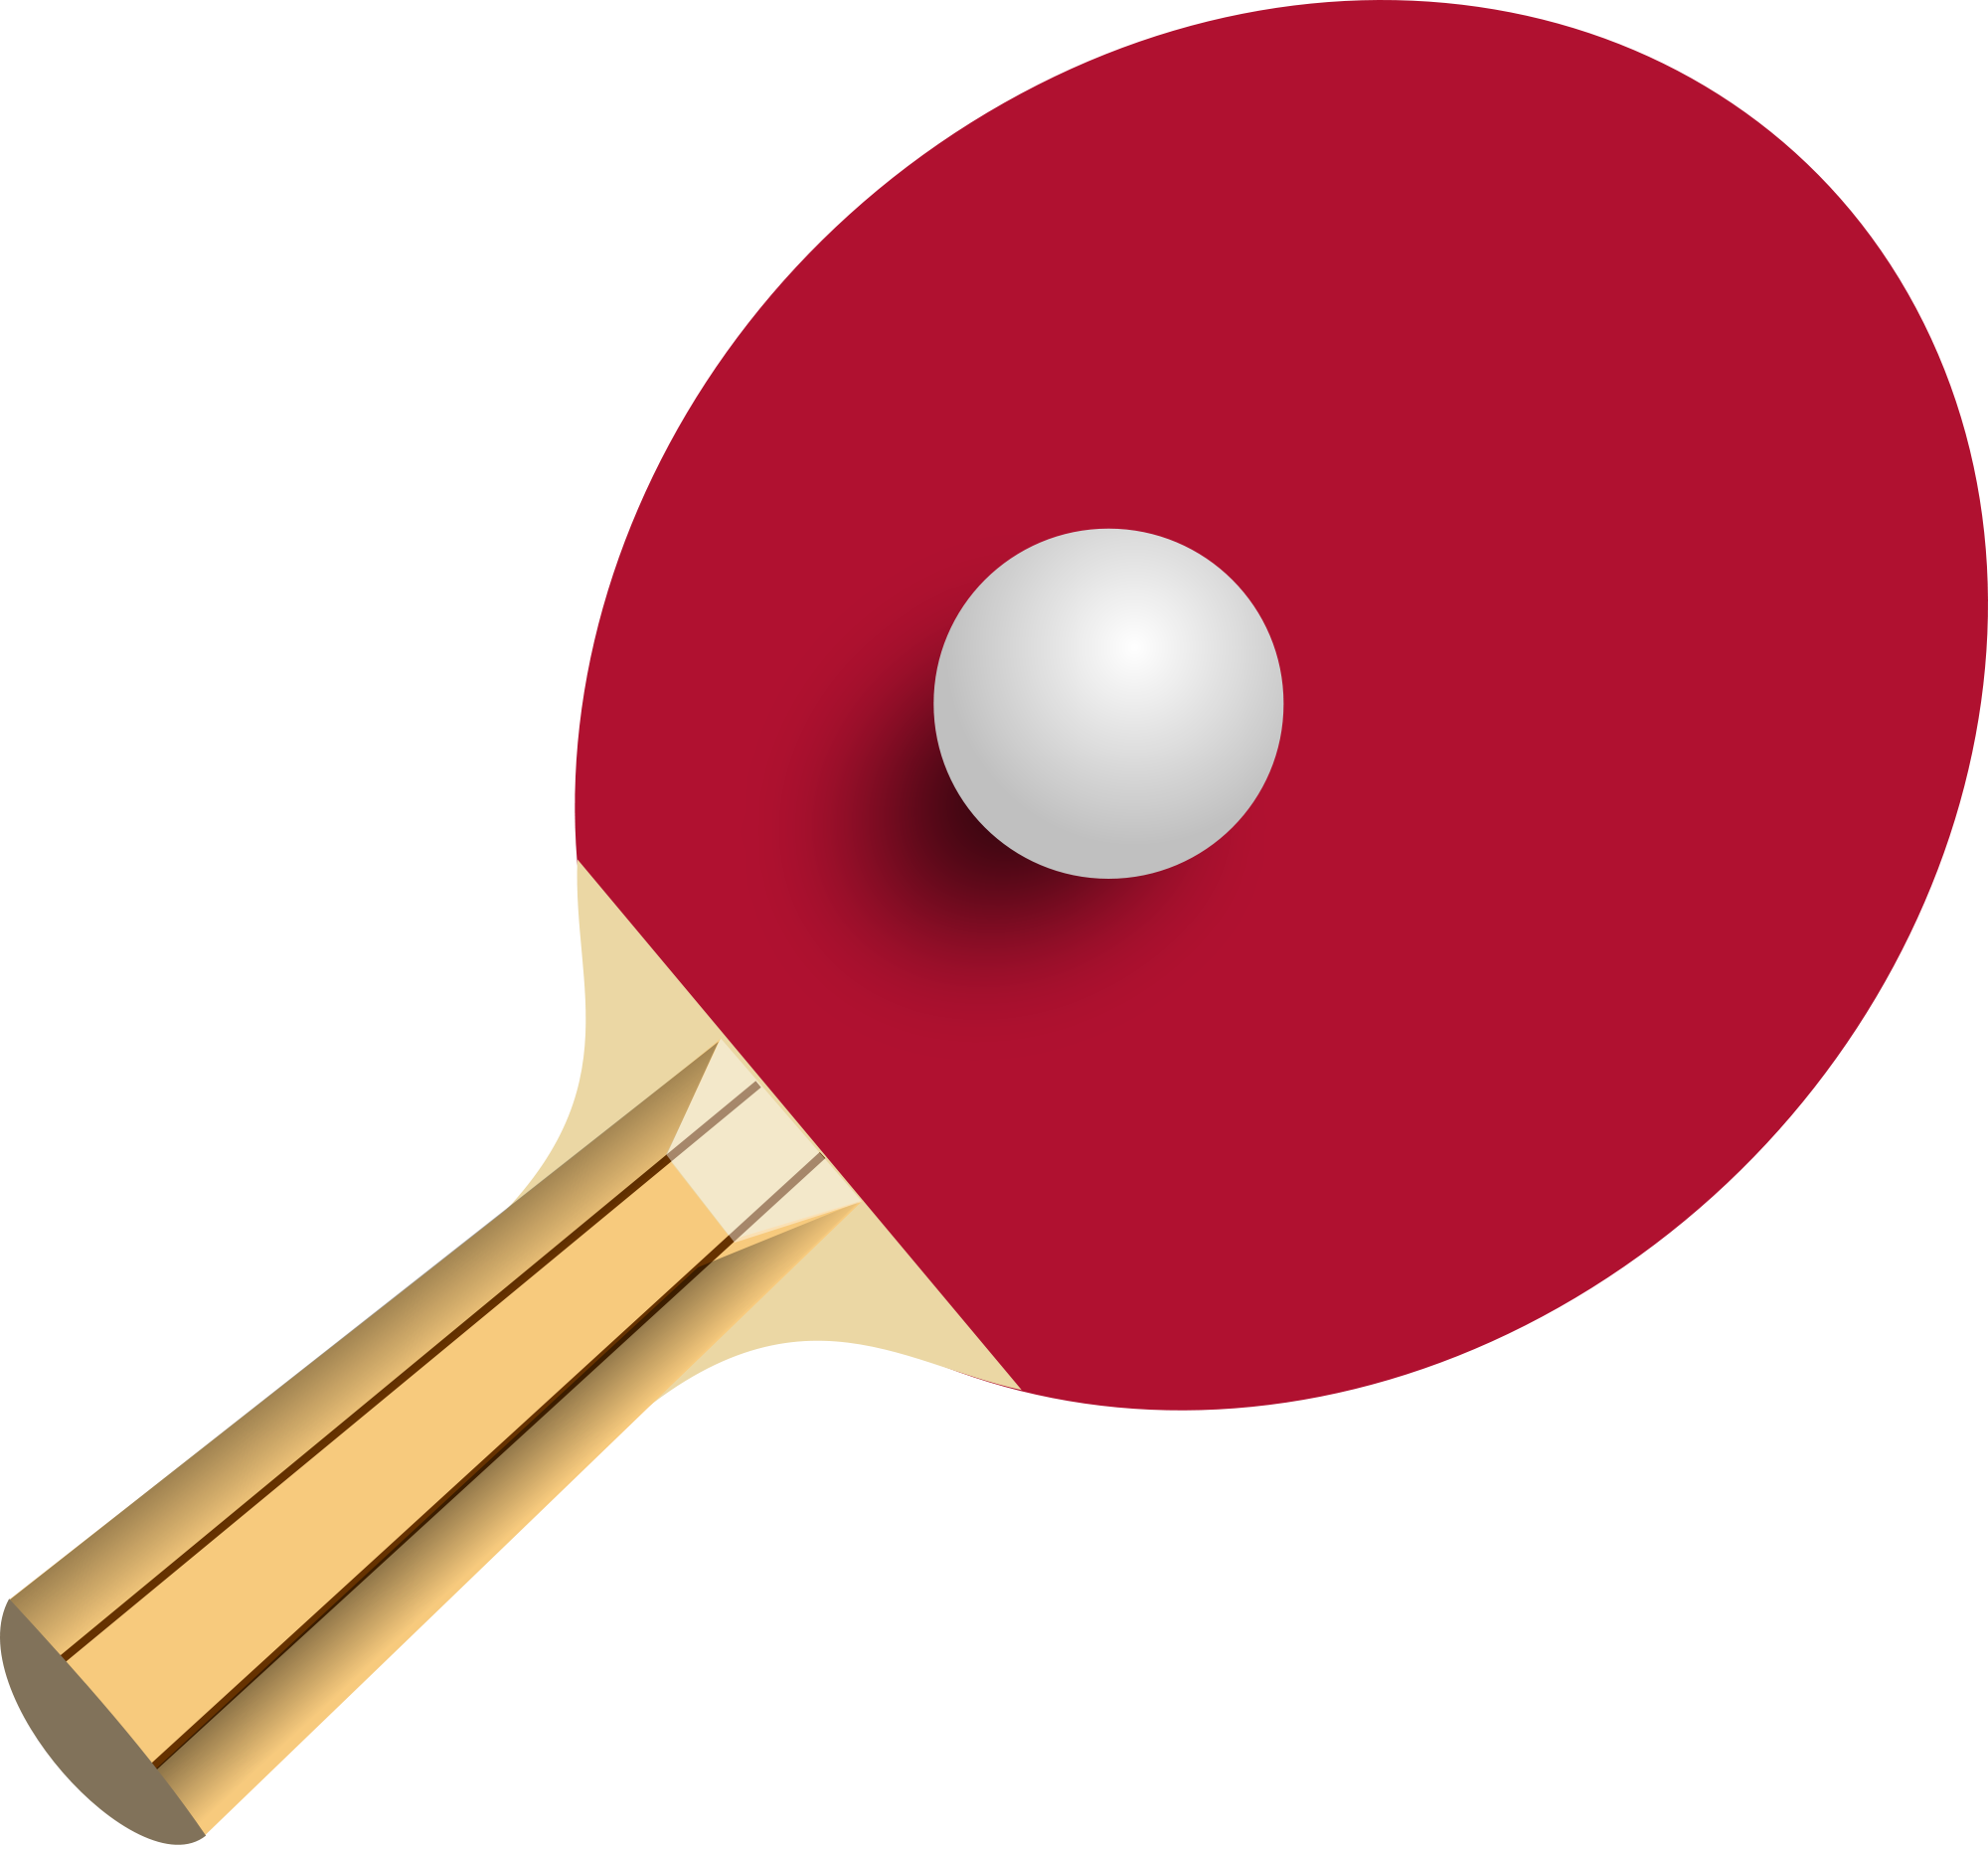 Ping Pong Free Download Png PNG Image